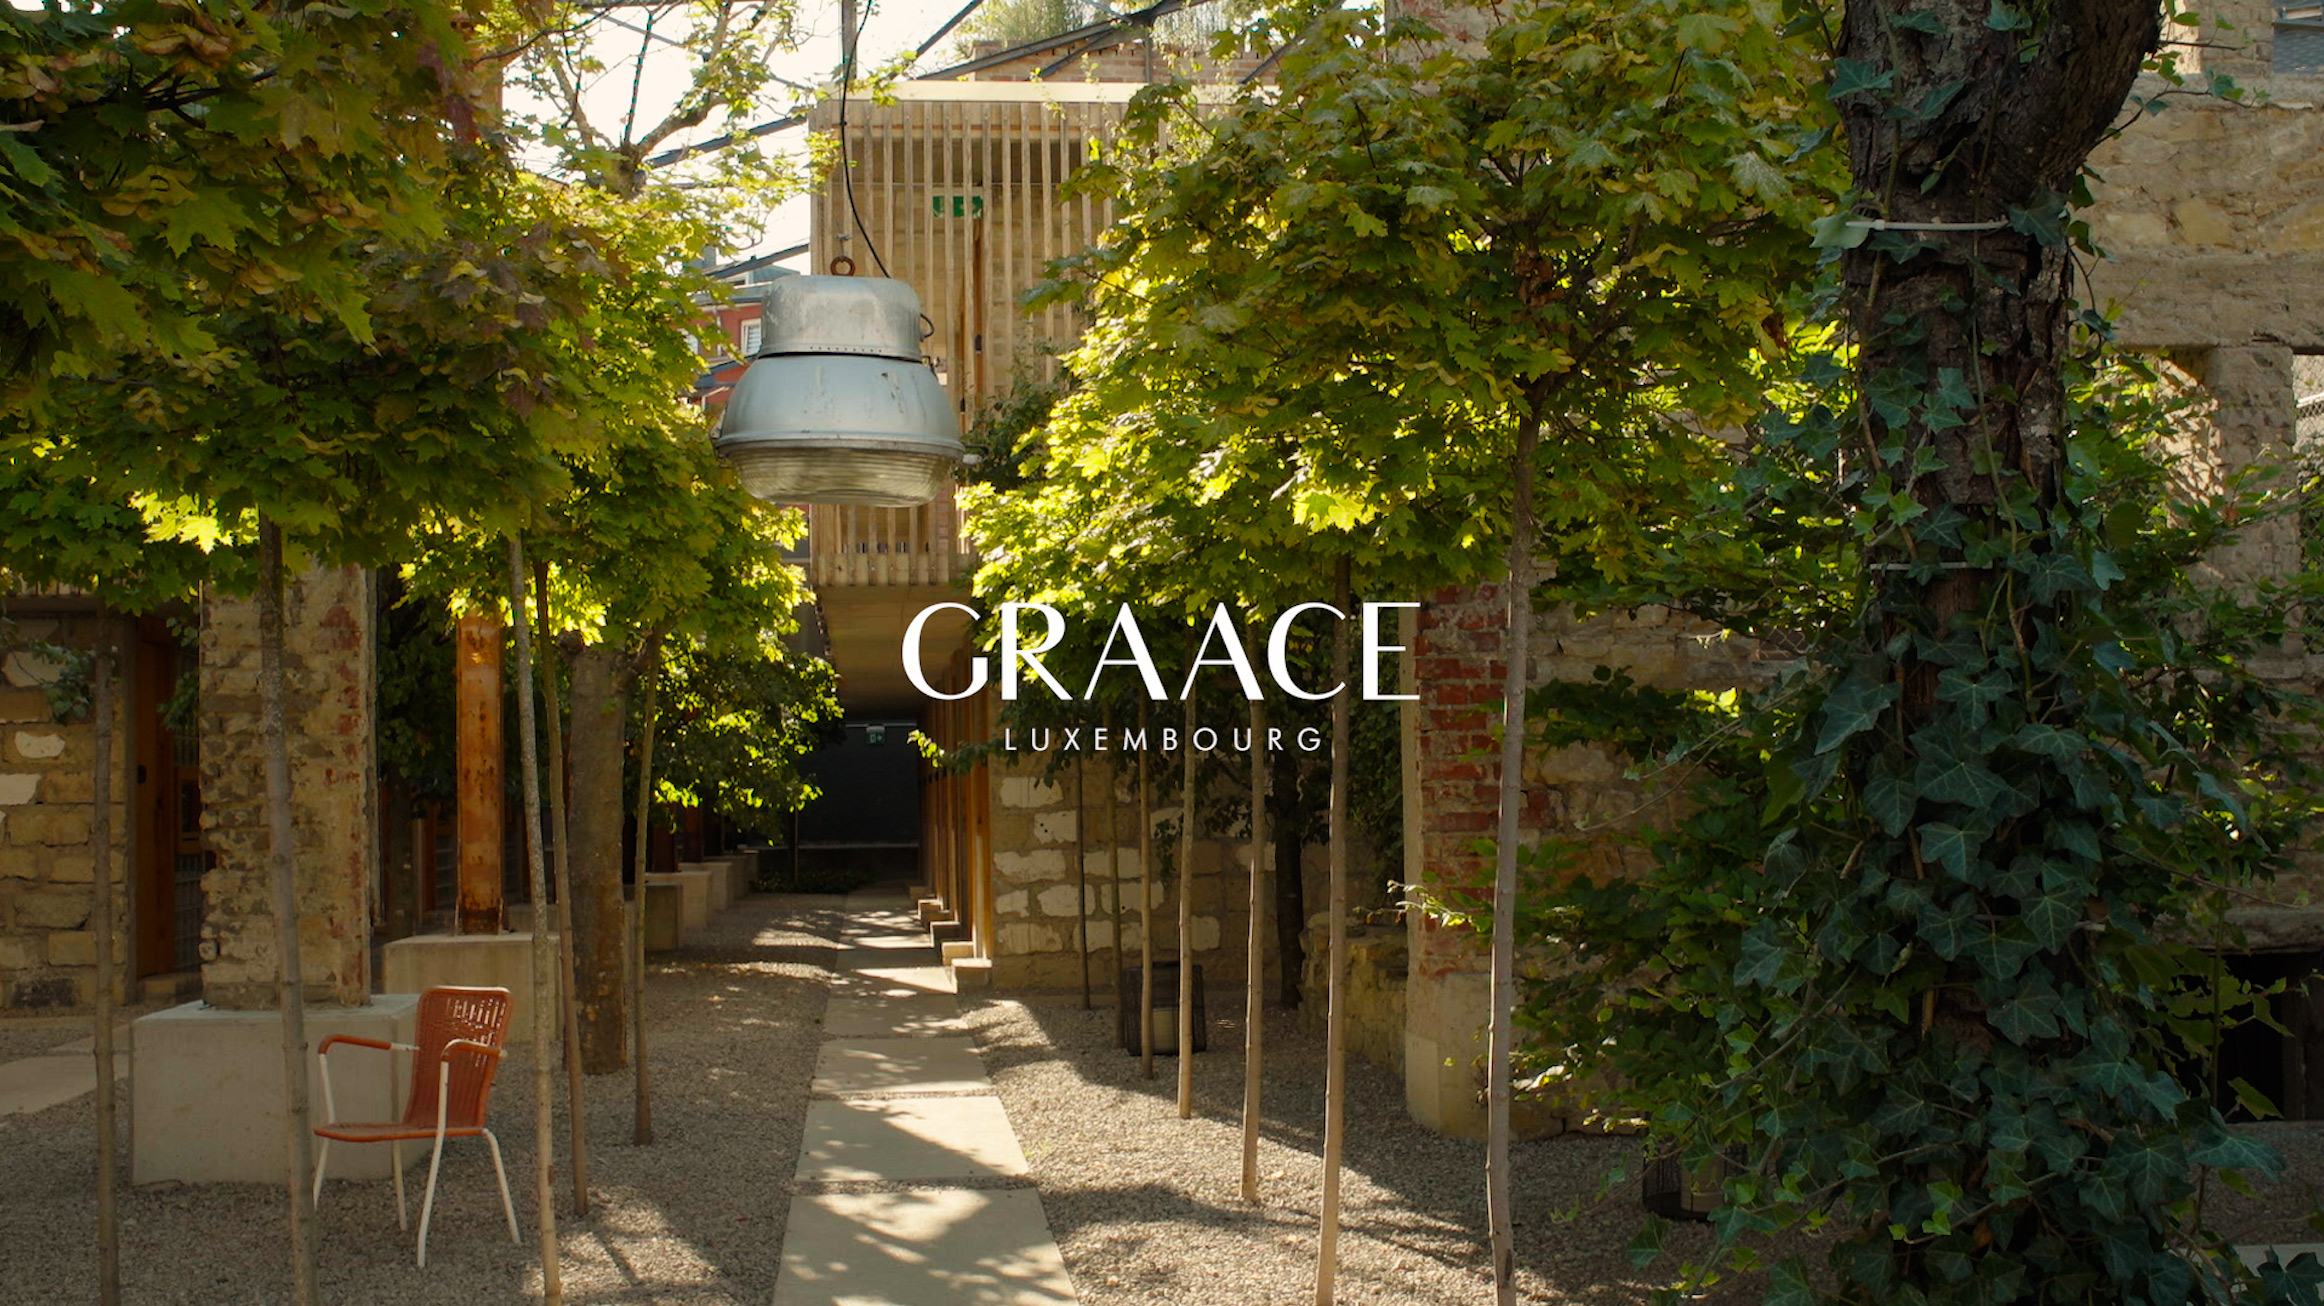 Graace Hotel